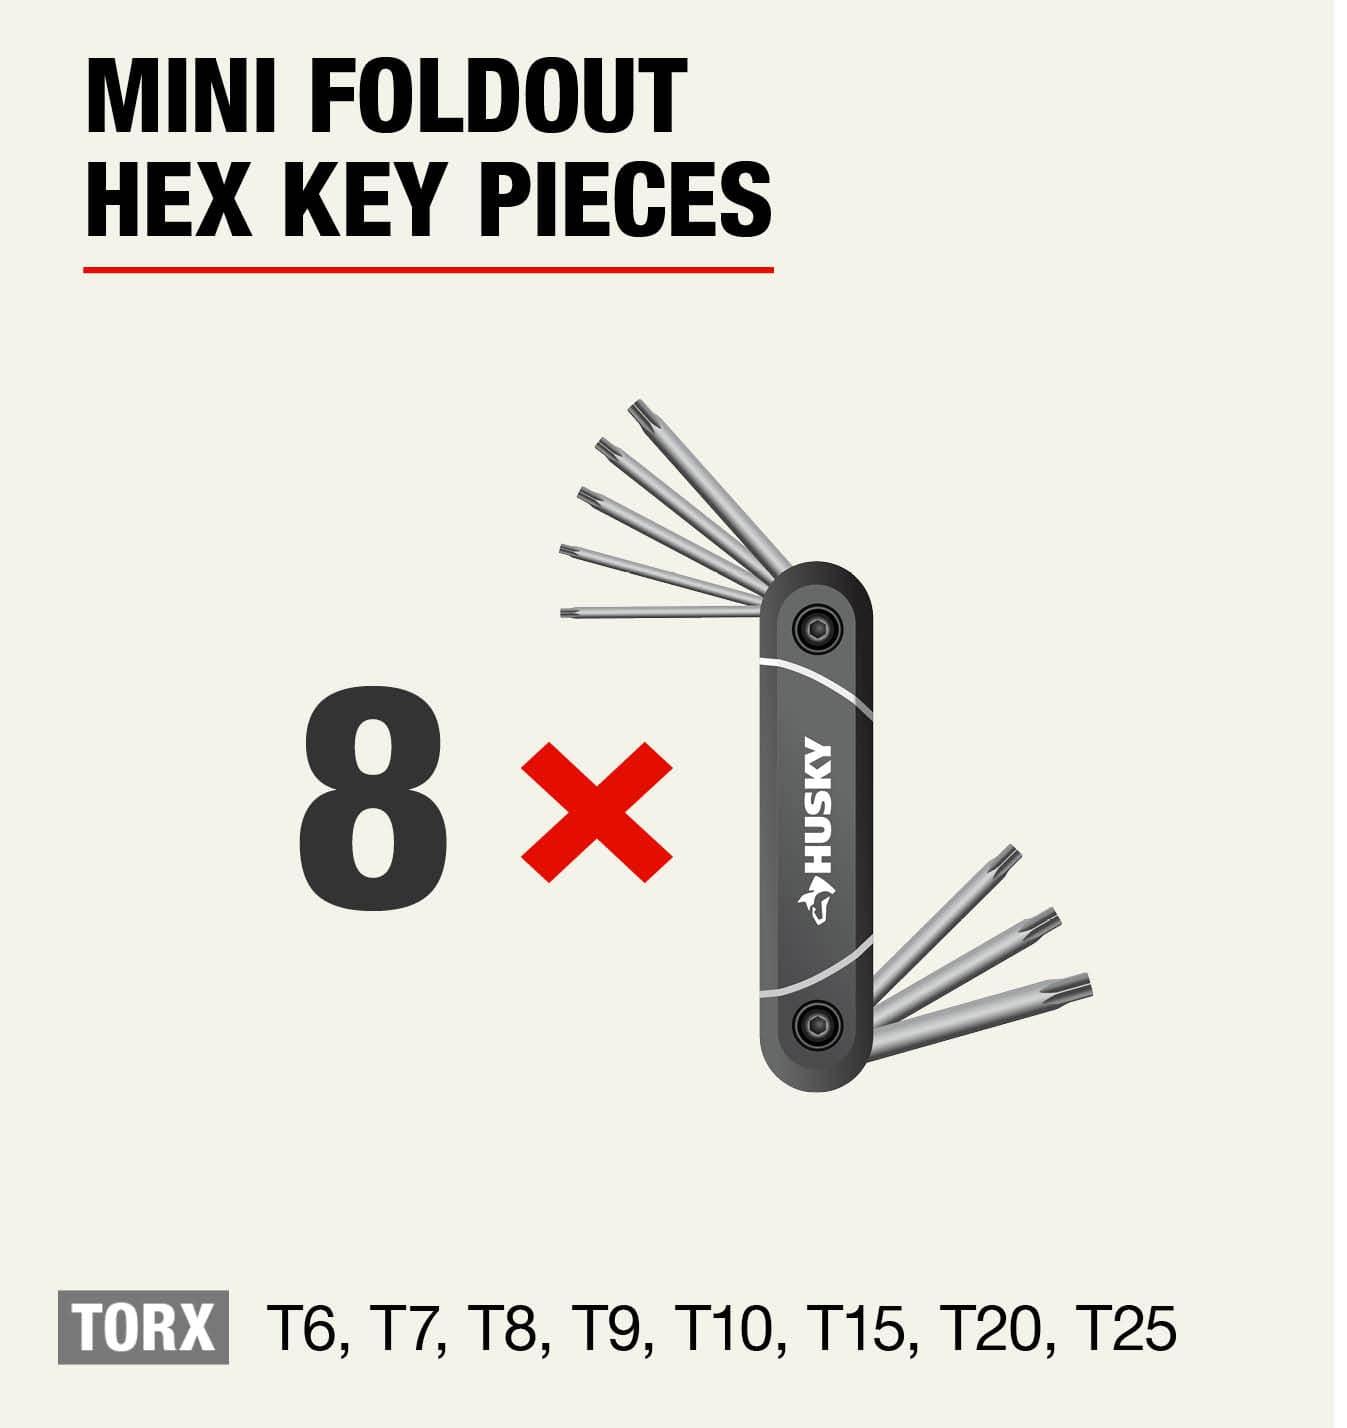 Husky Torx Mini Foldout Hex Keys